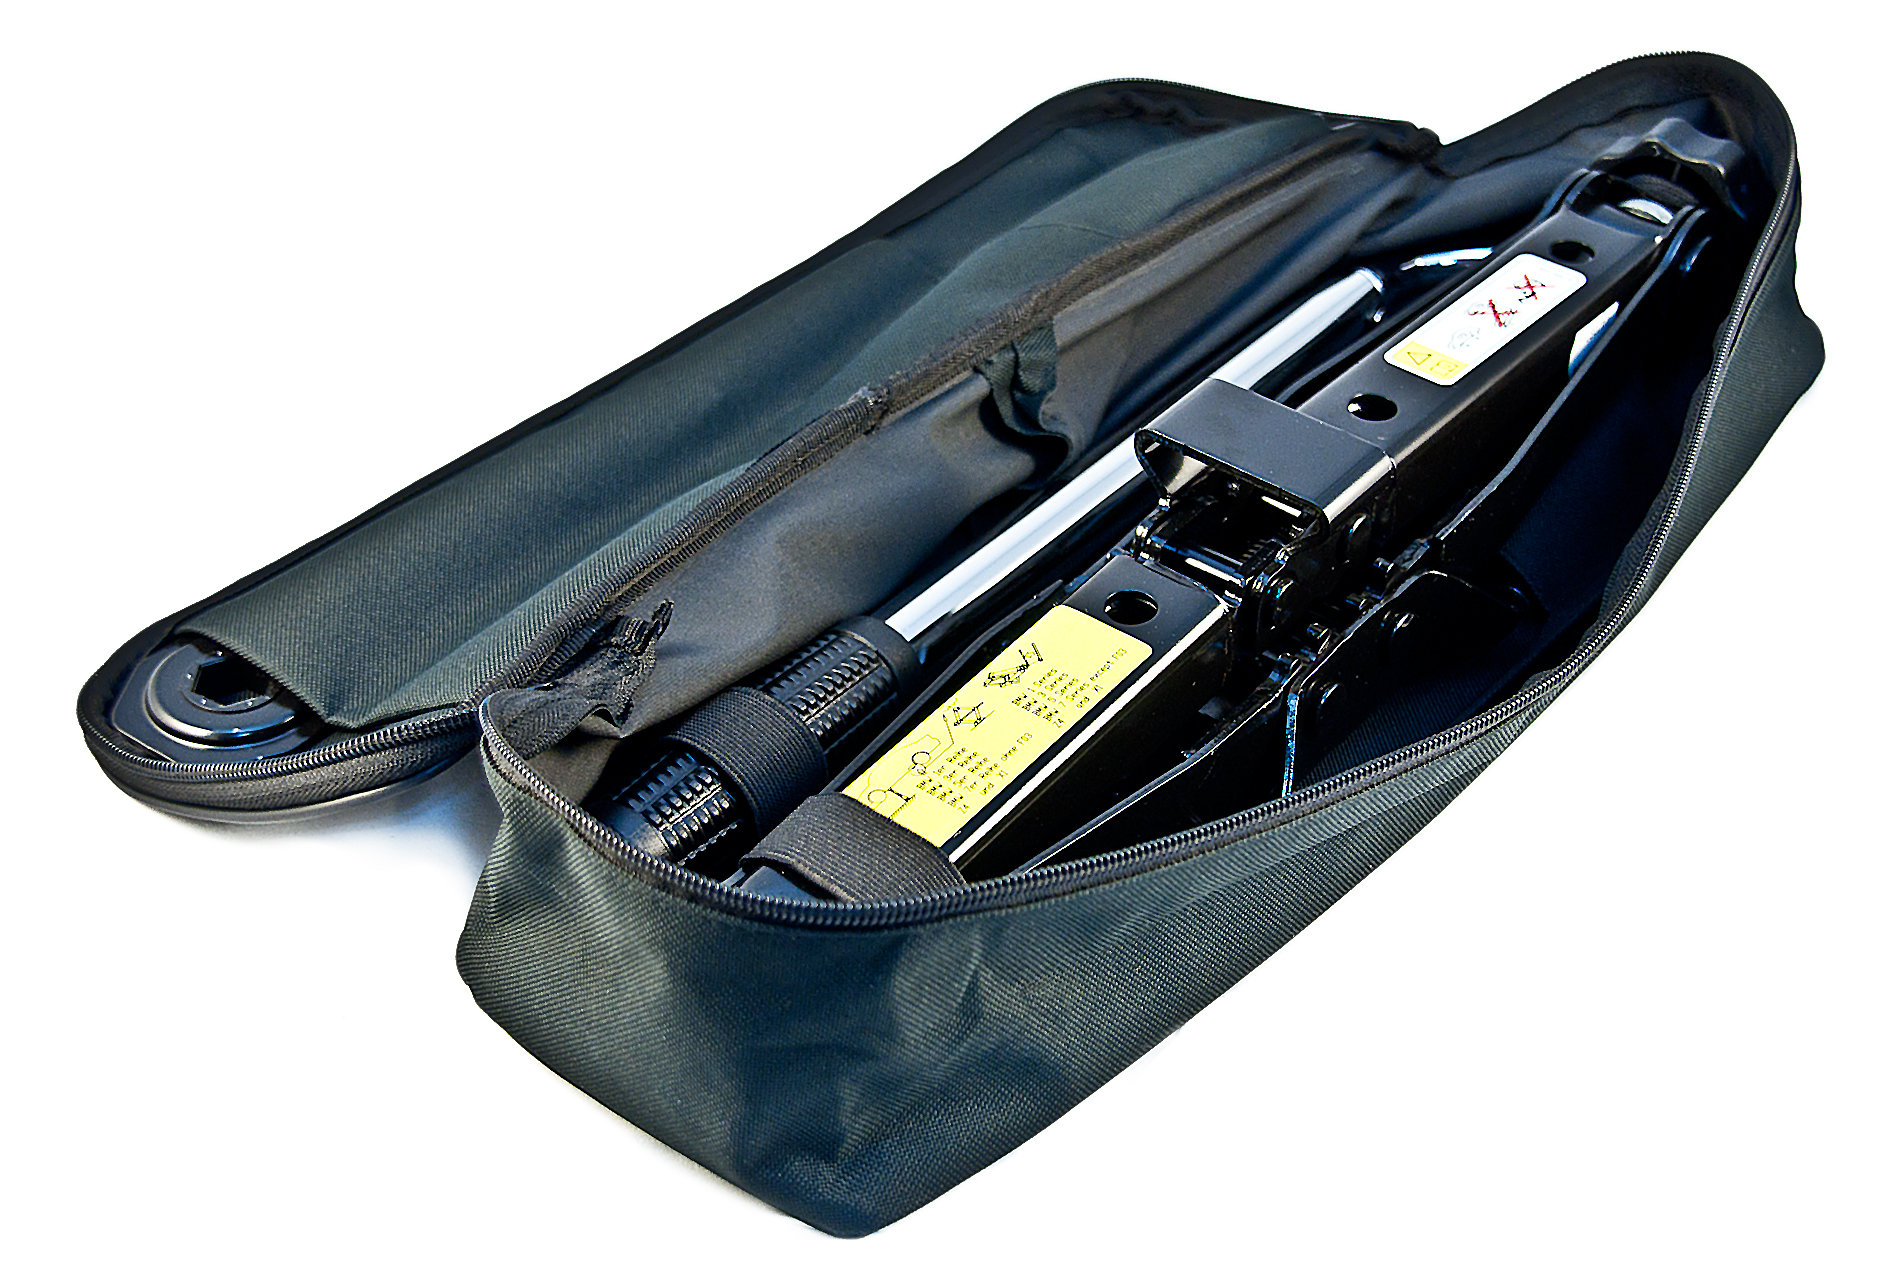 Bmw Genuine Car Lifting Jack+gloves+wrench+bag Set